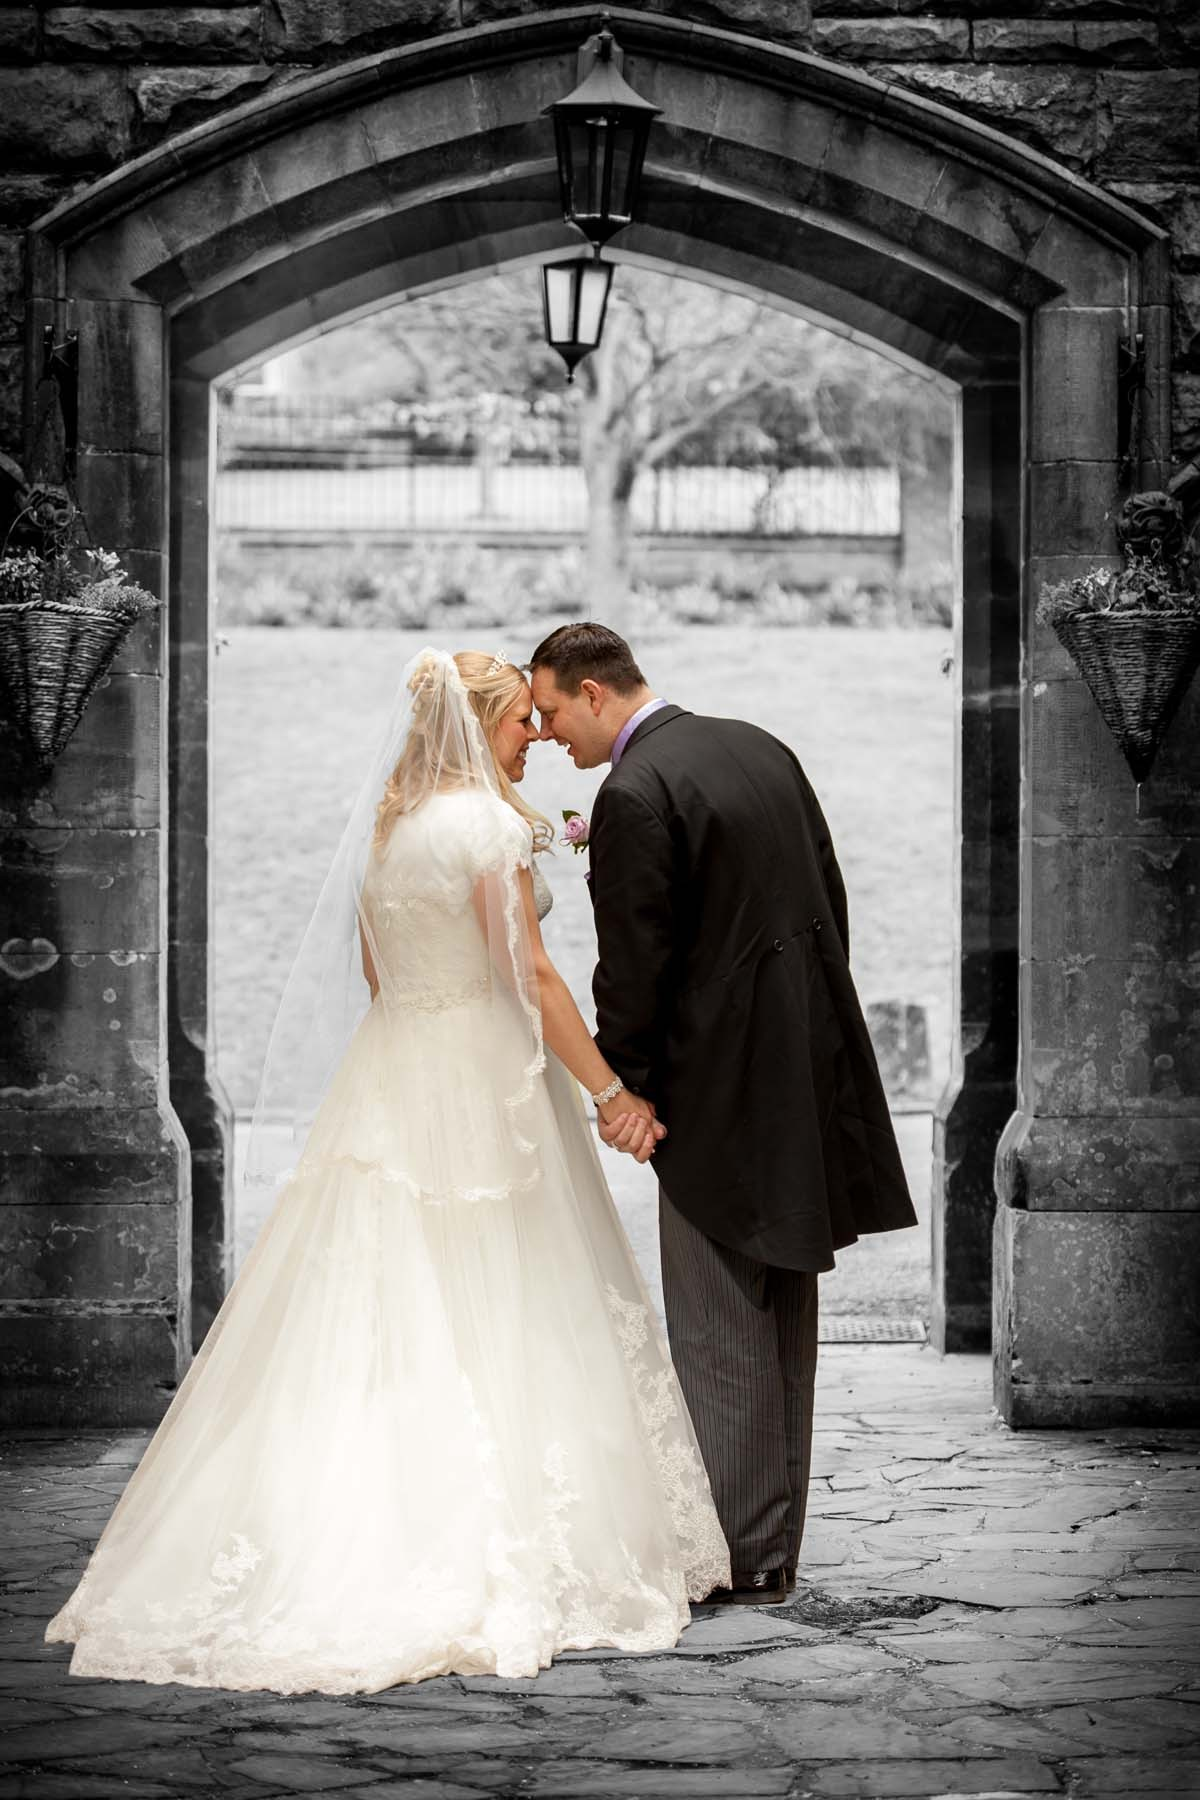 Sussex & Surrey Wedding Photographer - Bride & Groom (24)